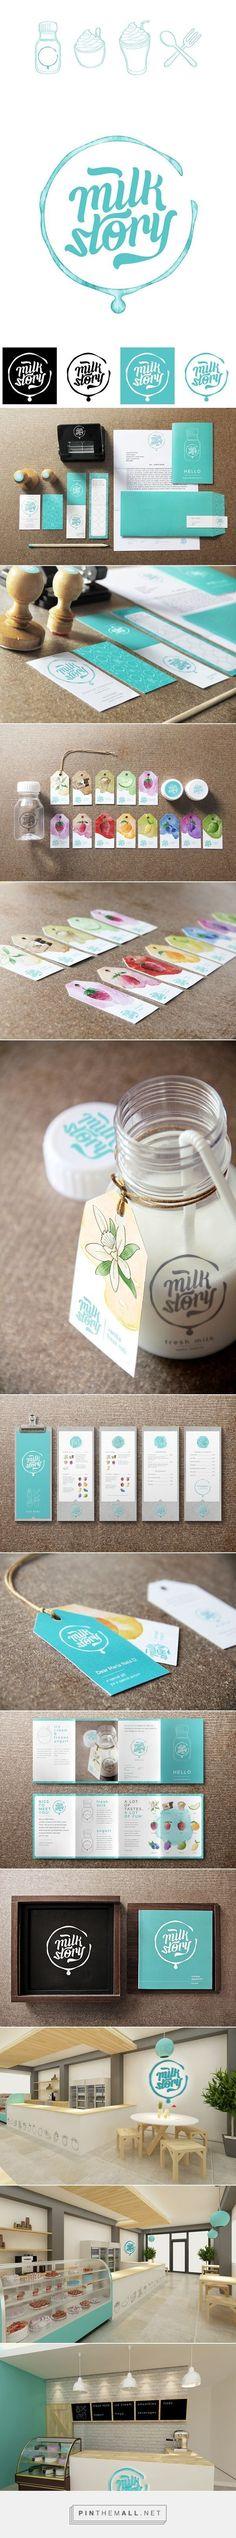 Milk Story Brand Identity on Behance - created via :